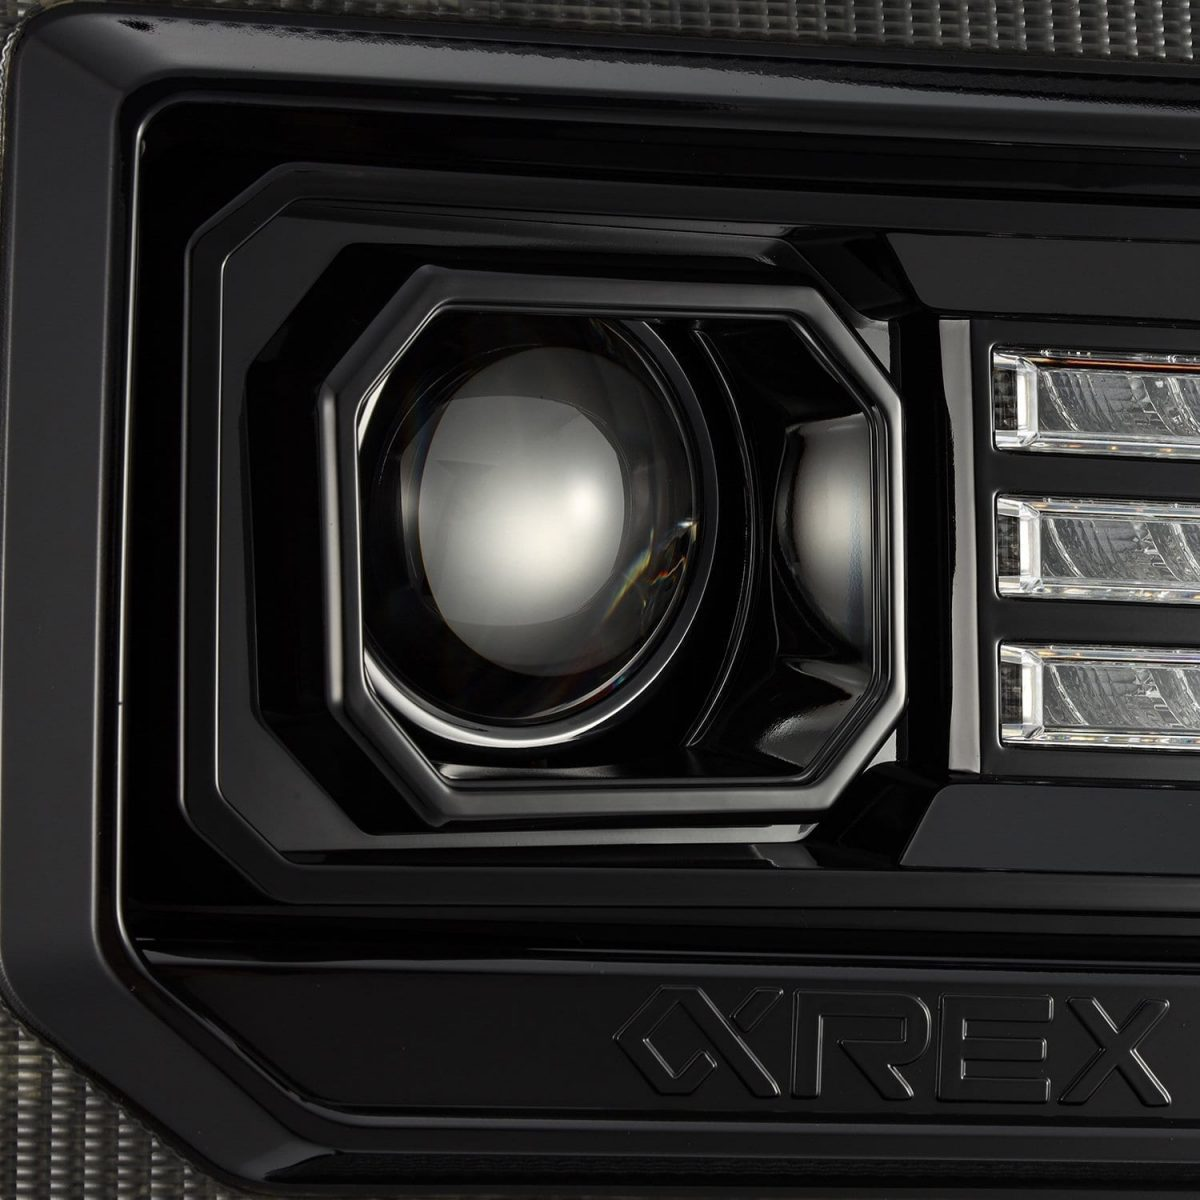 2014 2015 2016 2017 2018 GMC Sierra PRO-Series Halogen / LUXX-Series LED Projector Headlights